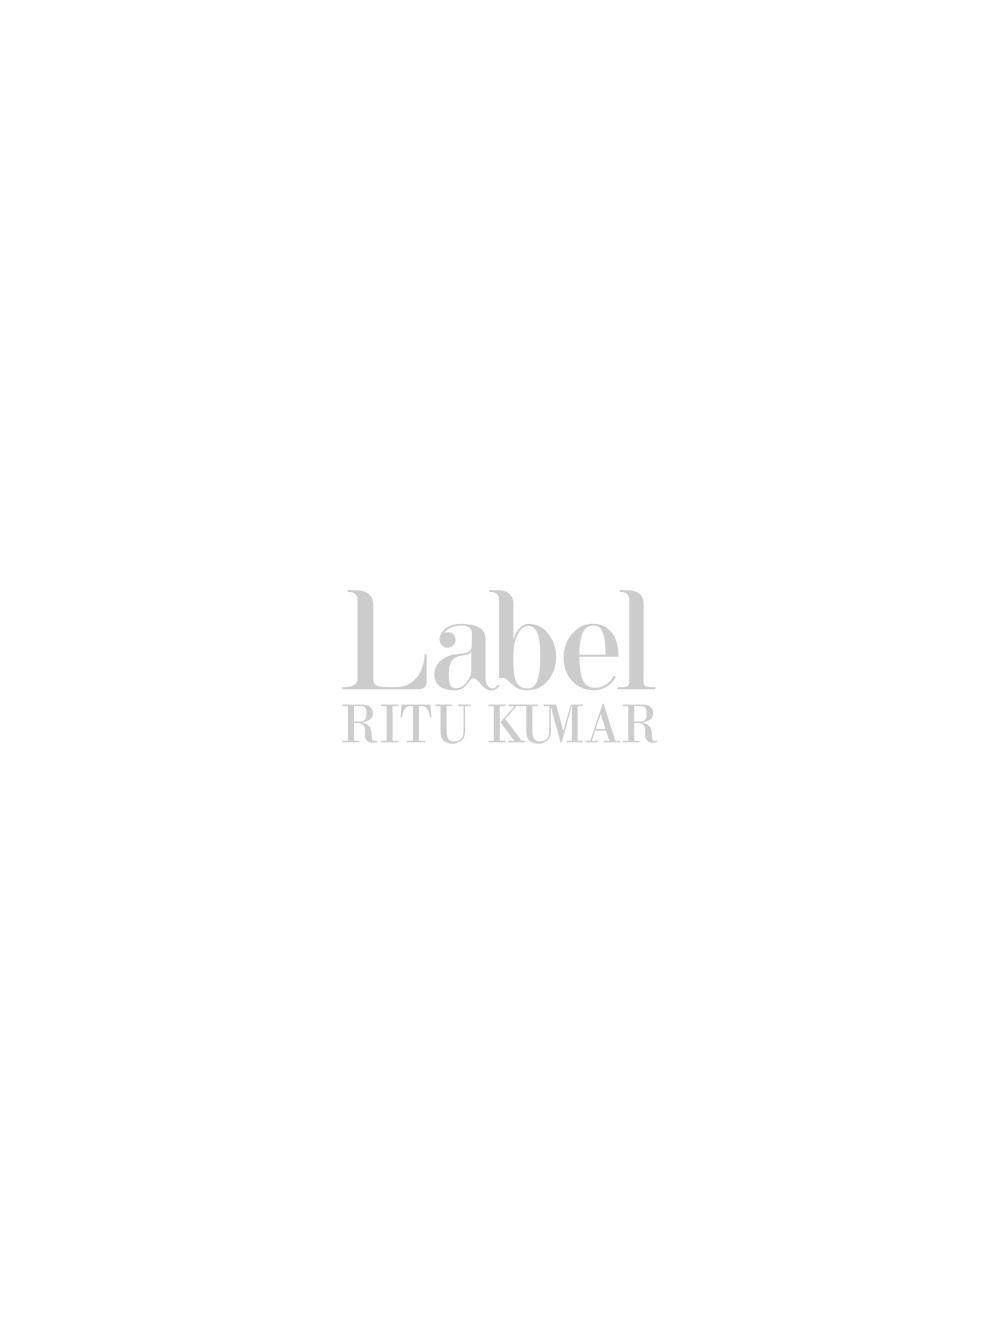 Maroon Embellished Long Dress by label ritu kumar